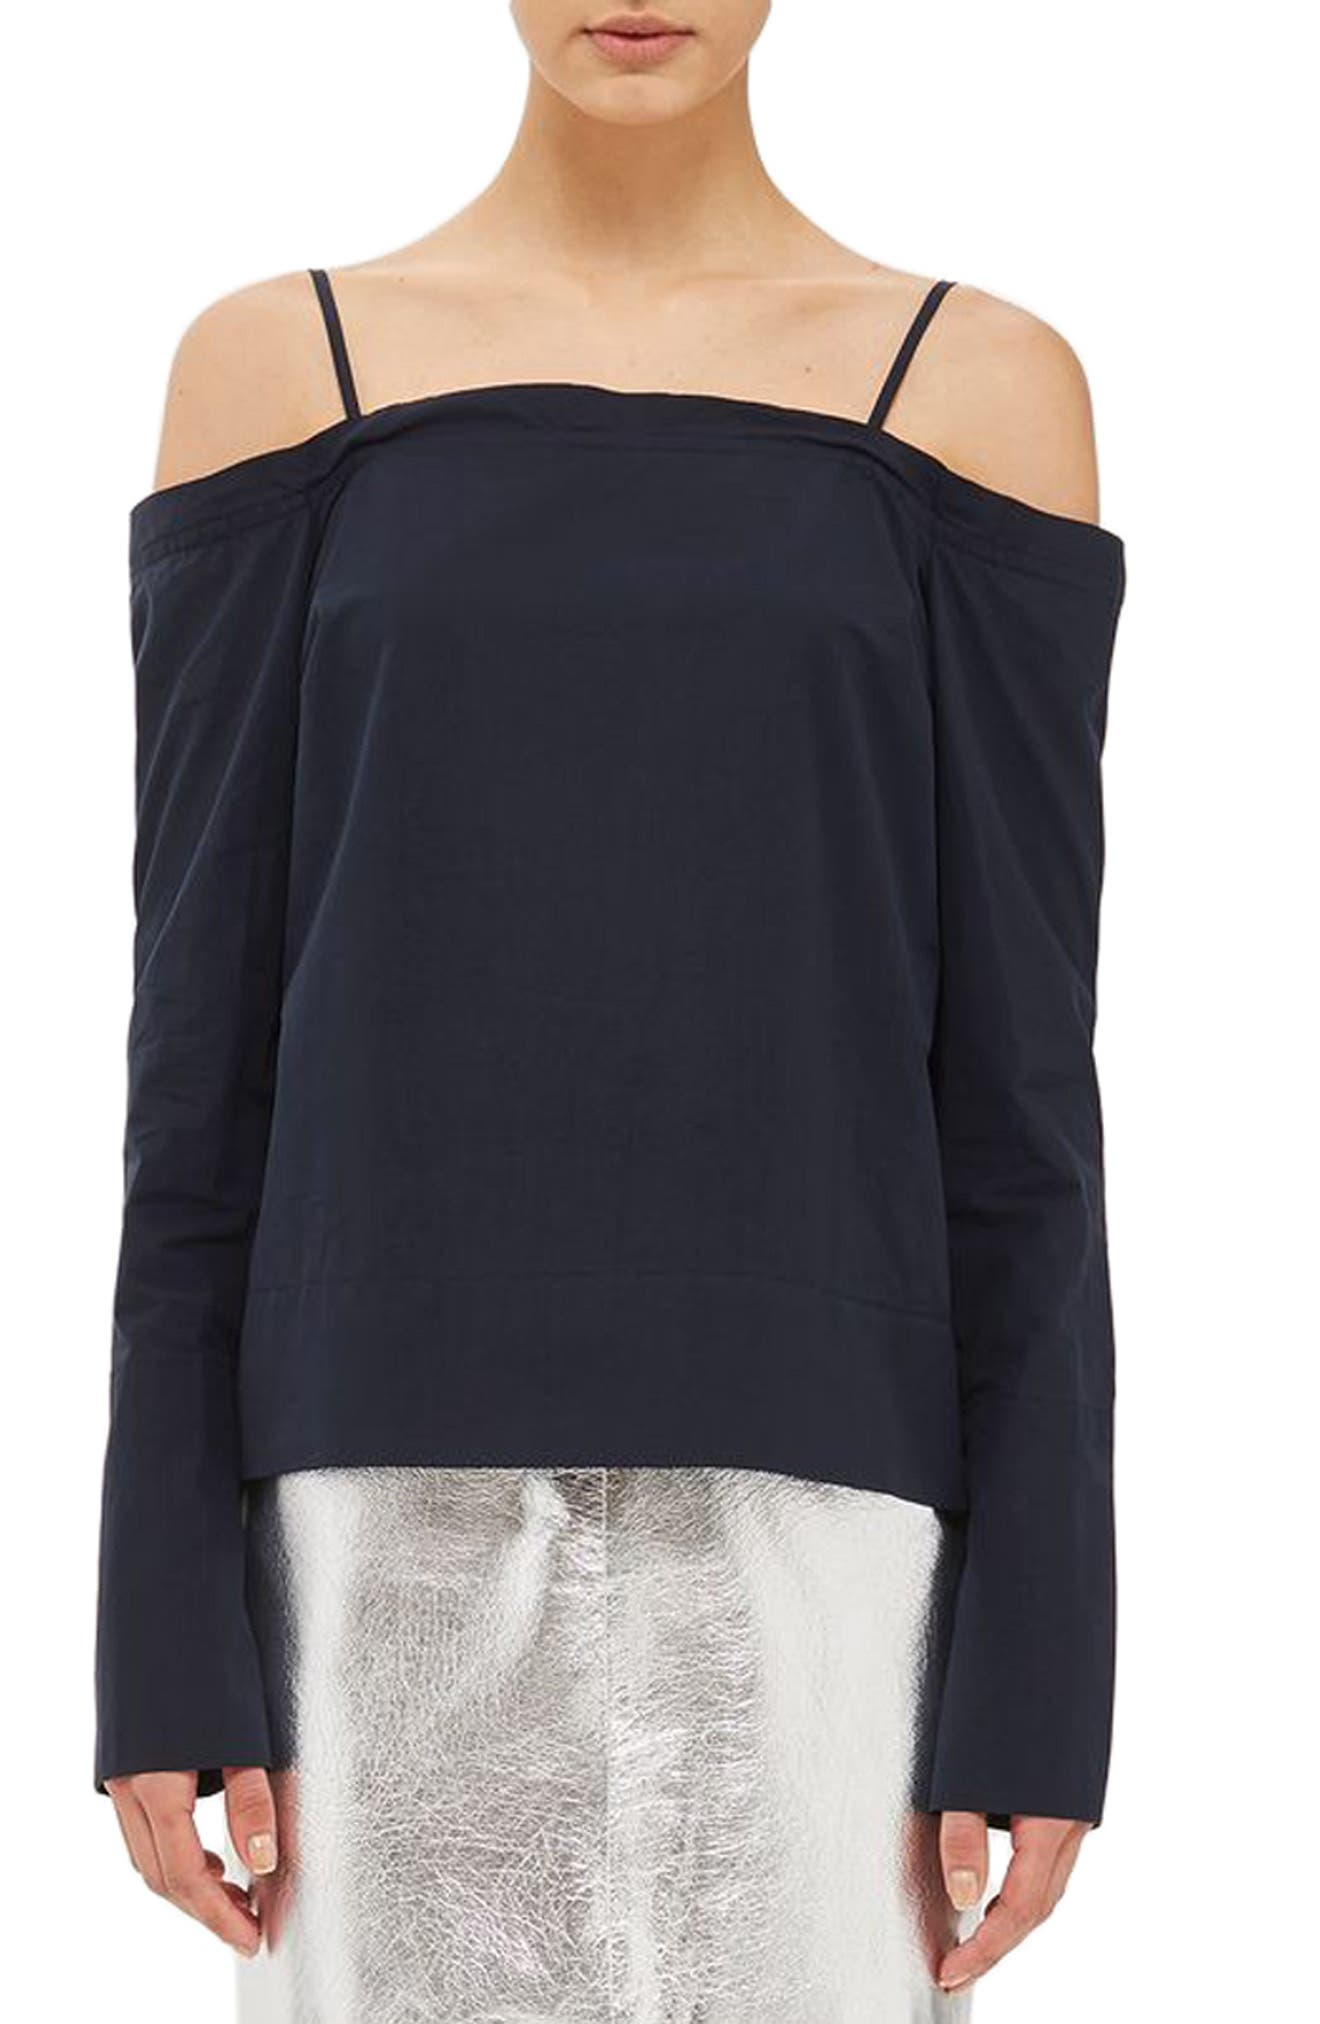 Topshop Boutique Tie Back Cold Shoulder Top